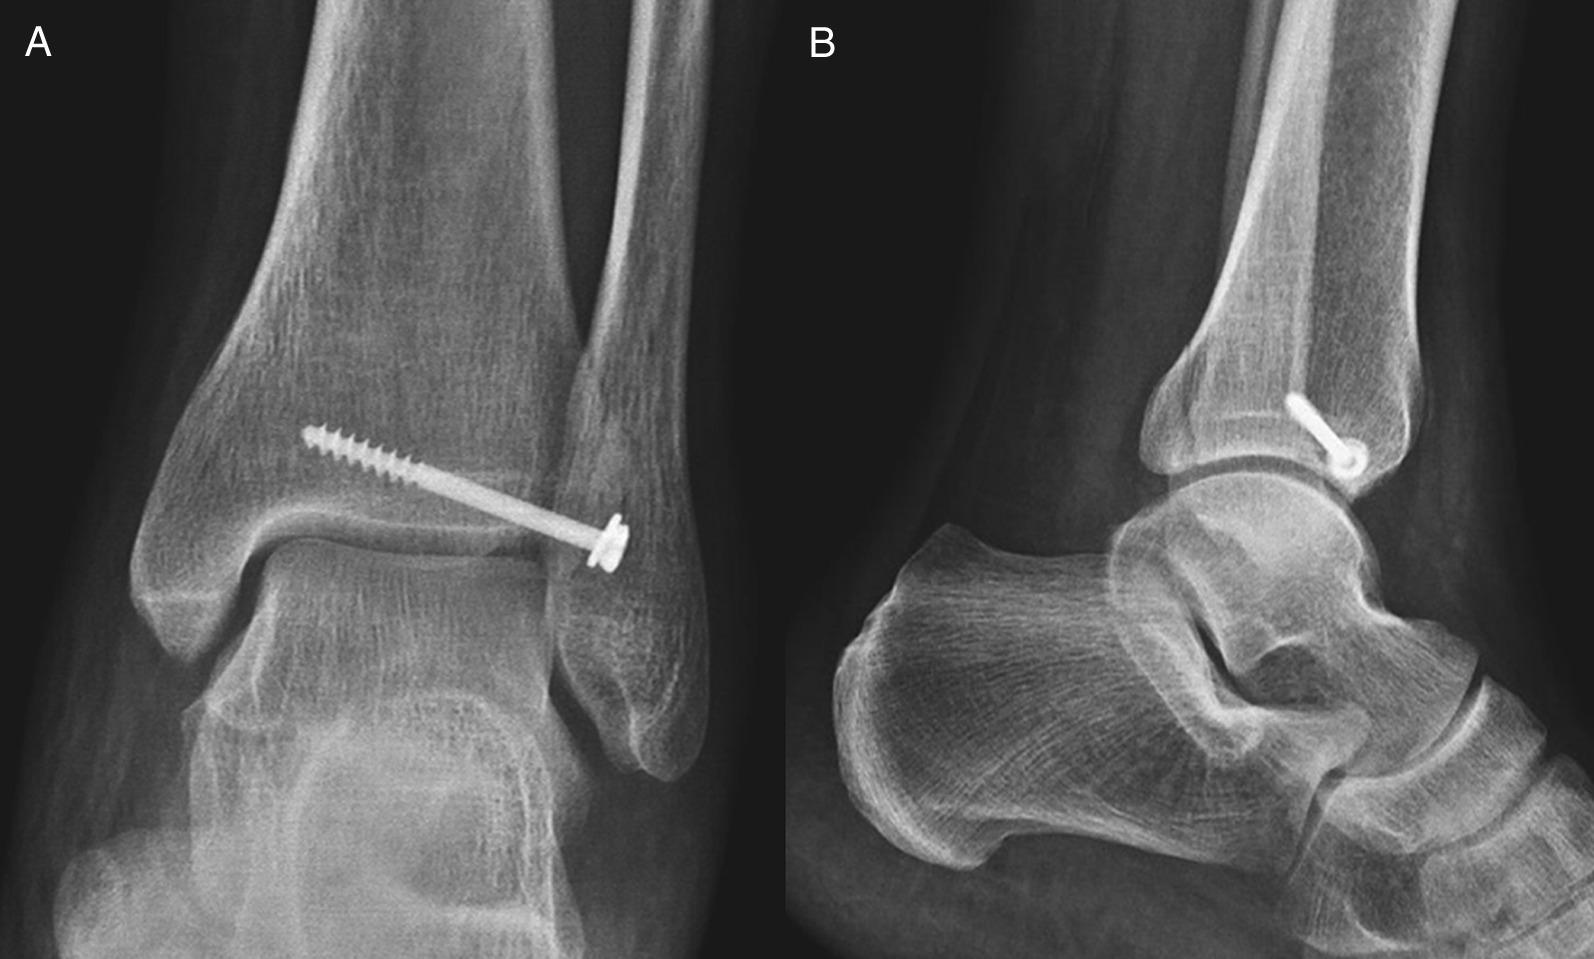 Epiphyseal Bone Fracture